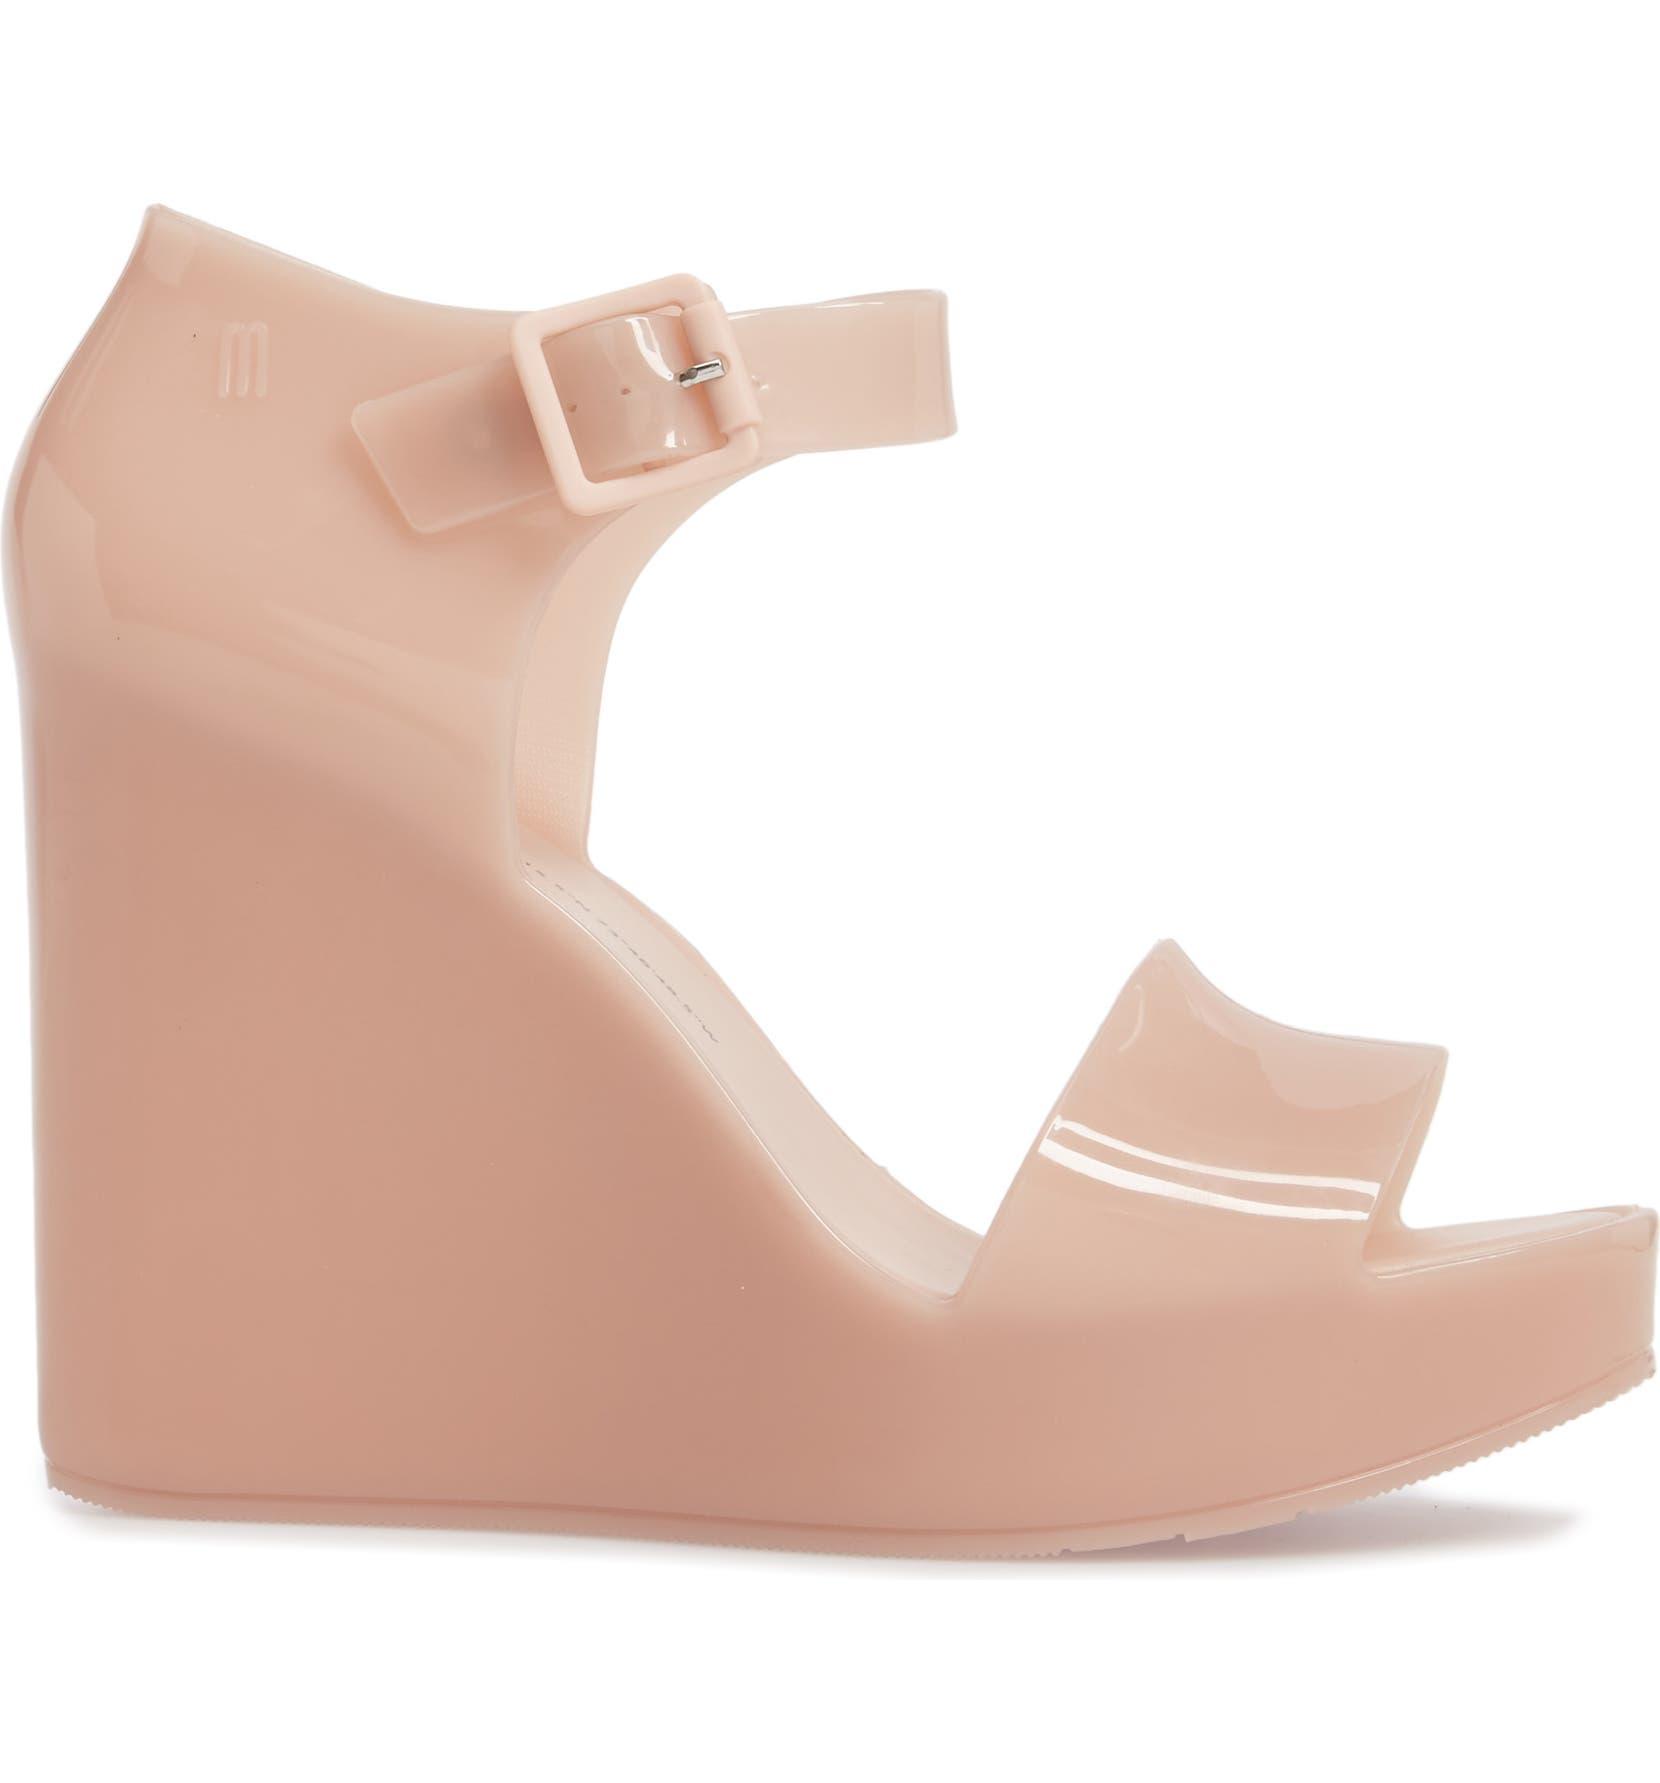 c286aa2a925 Melissa Mar Platform Wedge Sandal